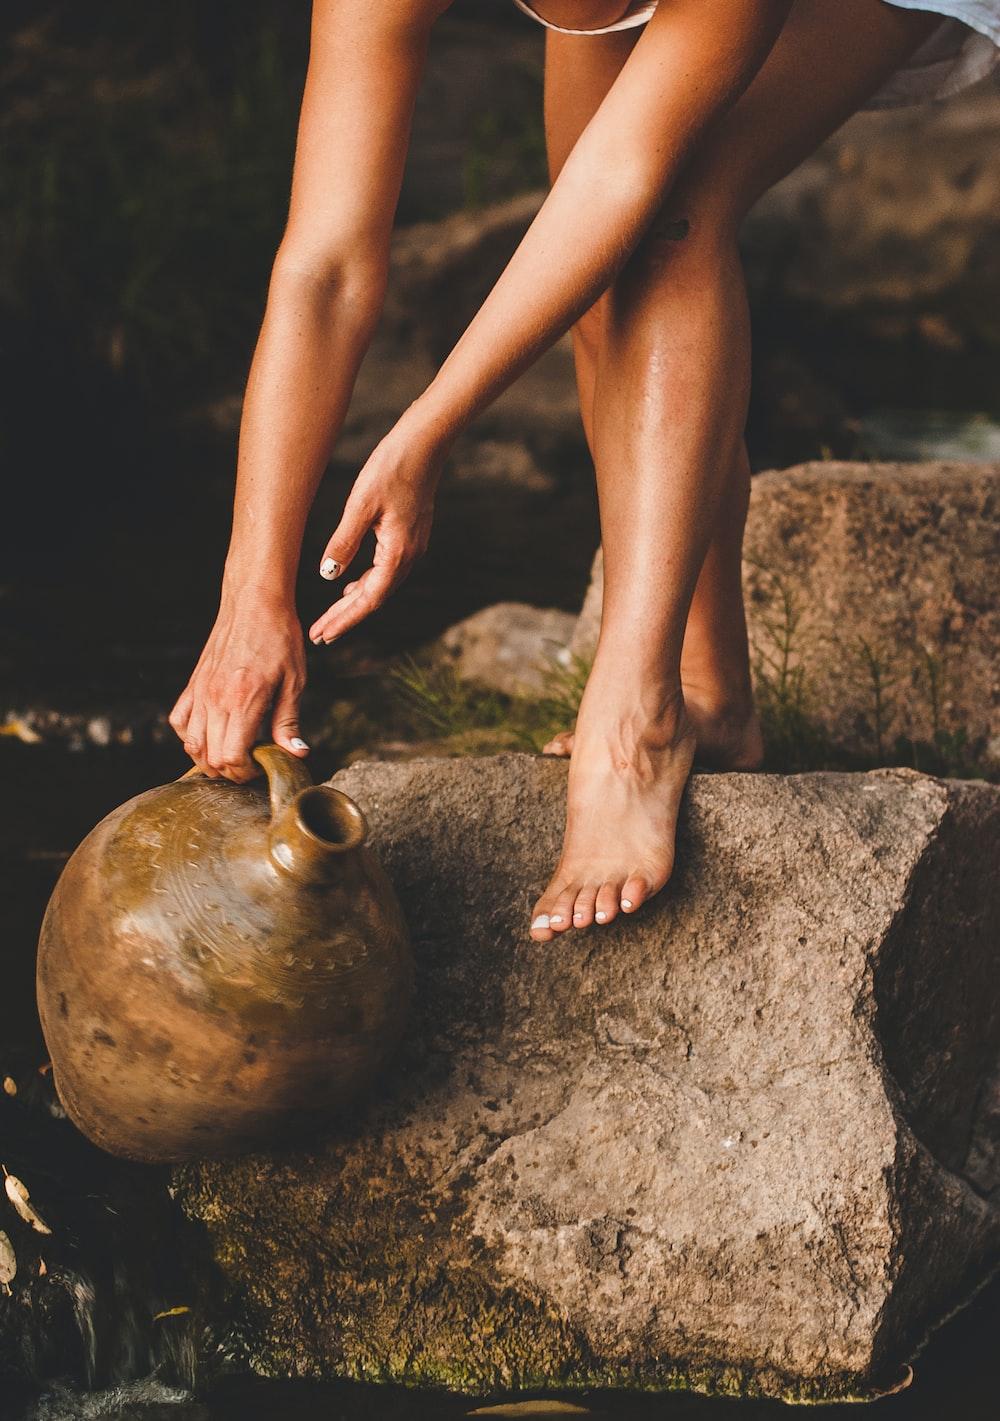 woman in black panty sitting on brown rock